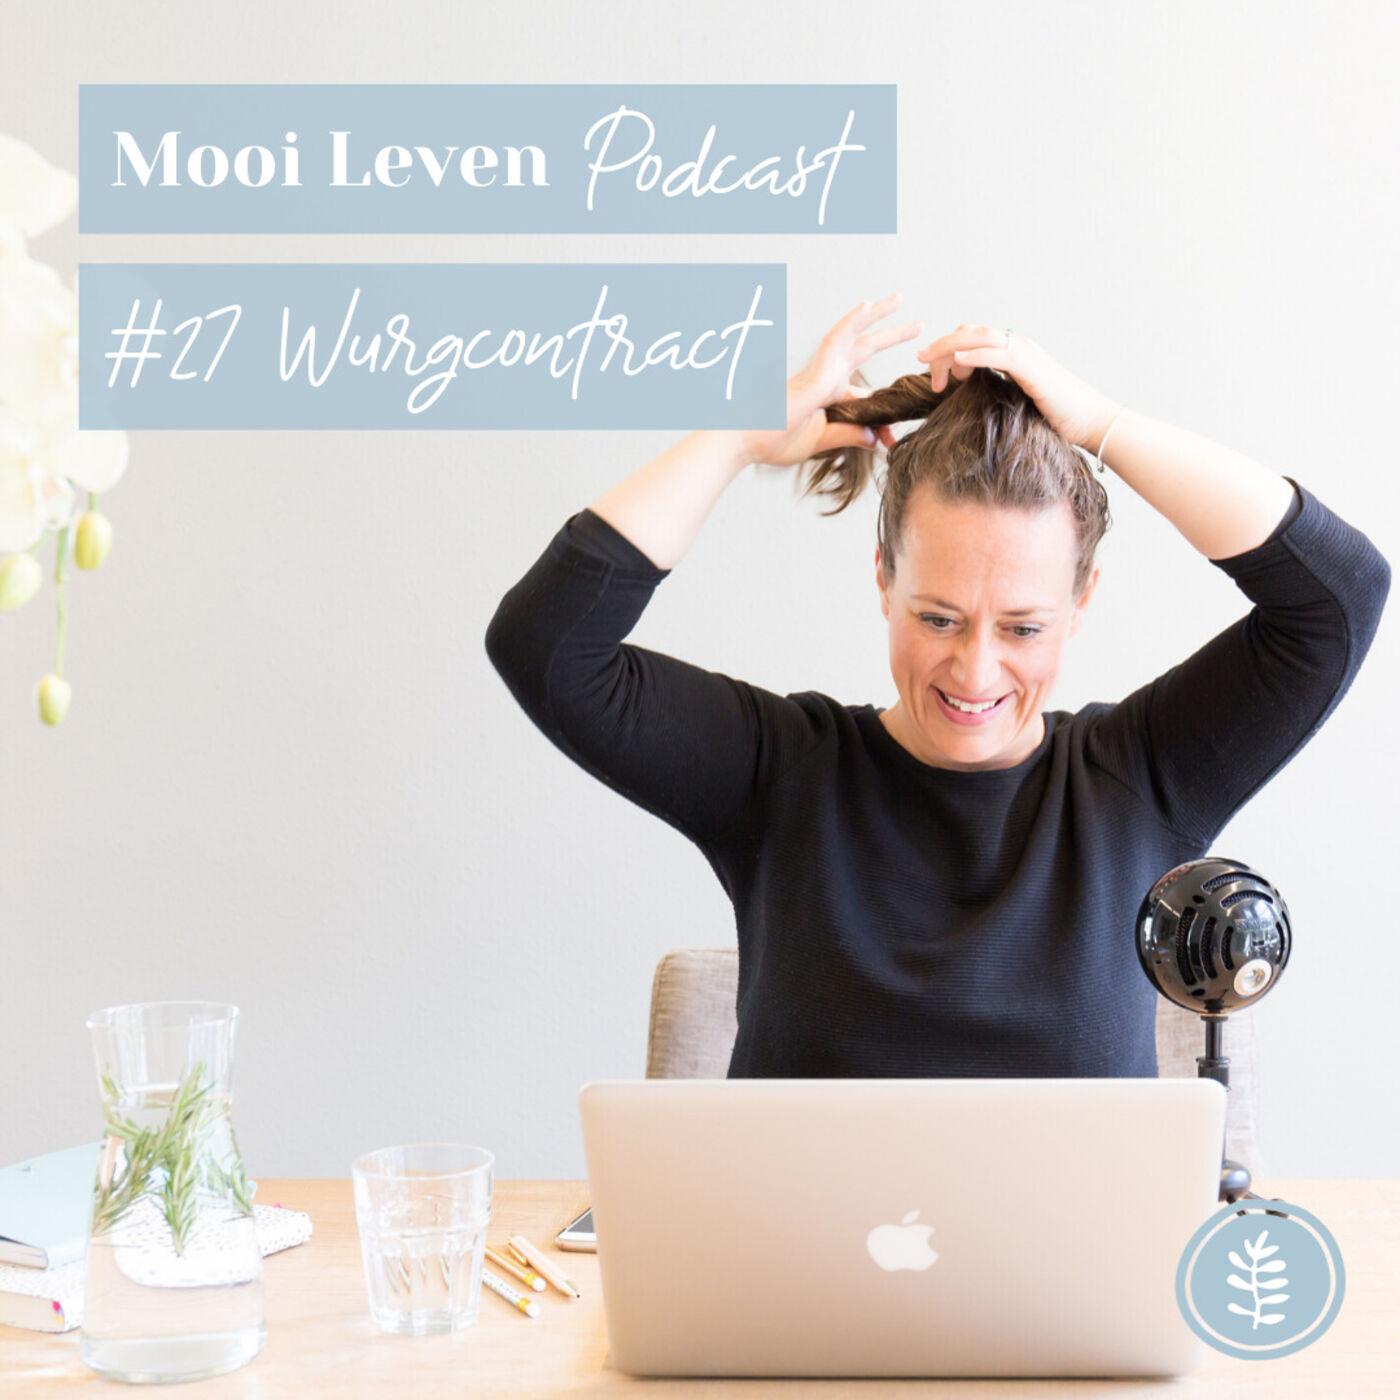 Mooi Leven Podcast #27 | Wurgcontract